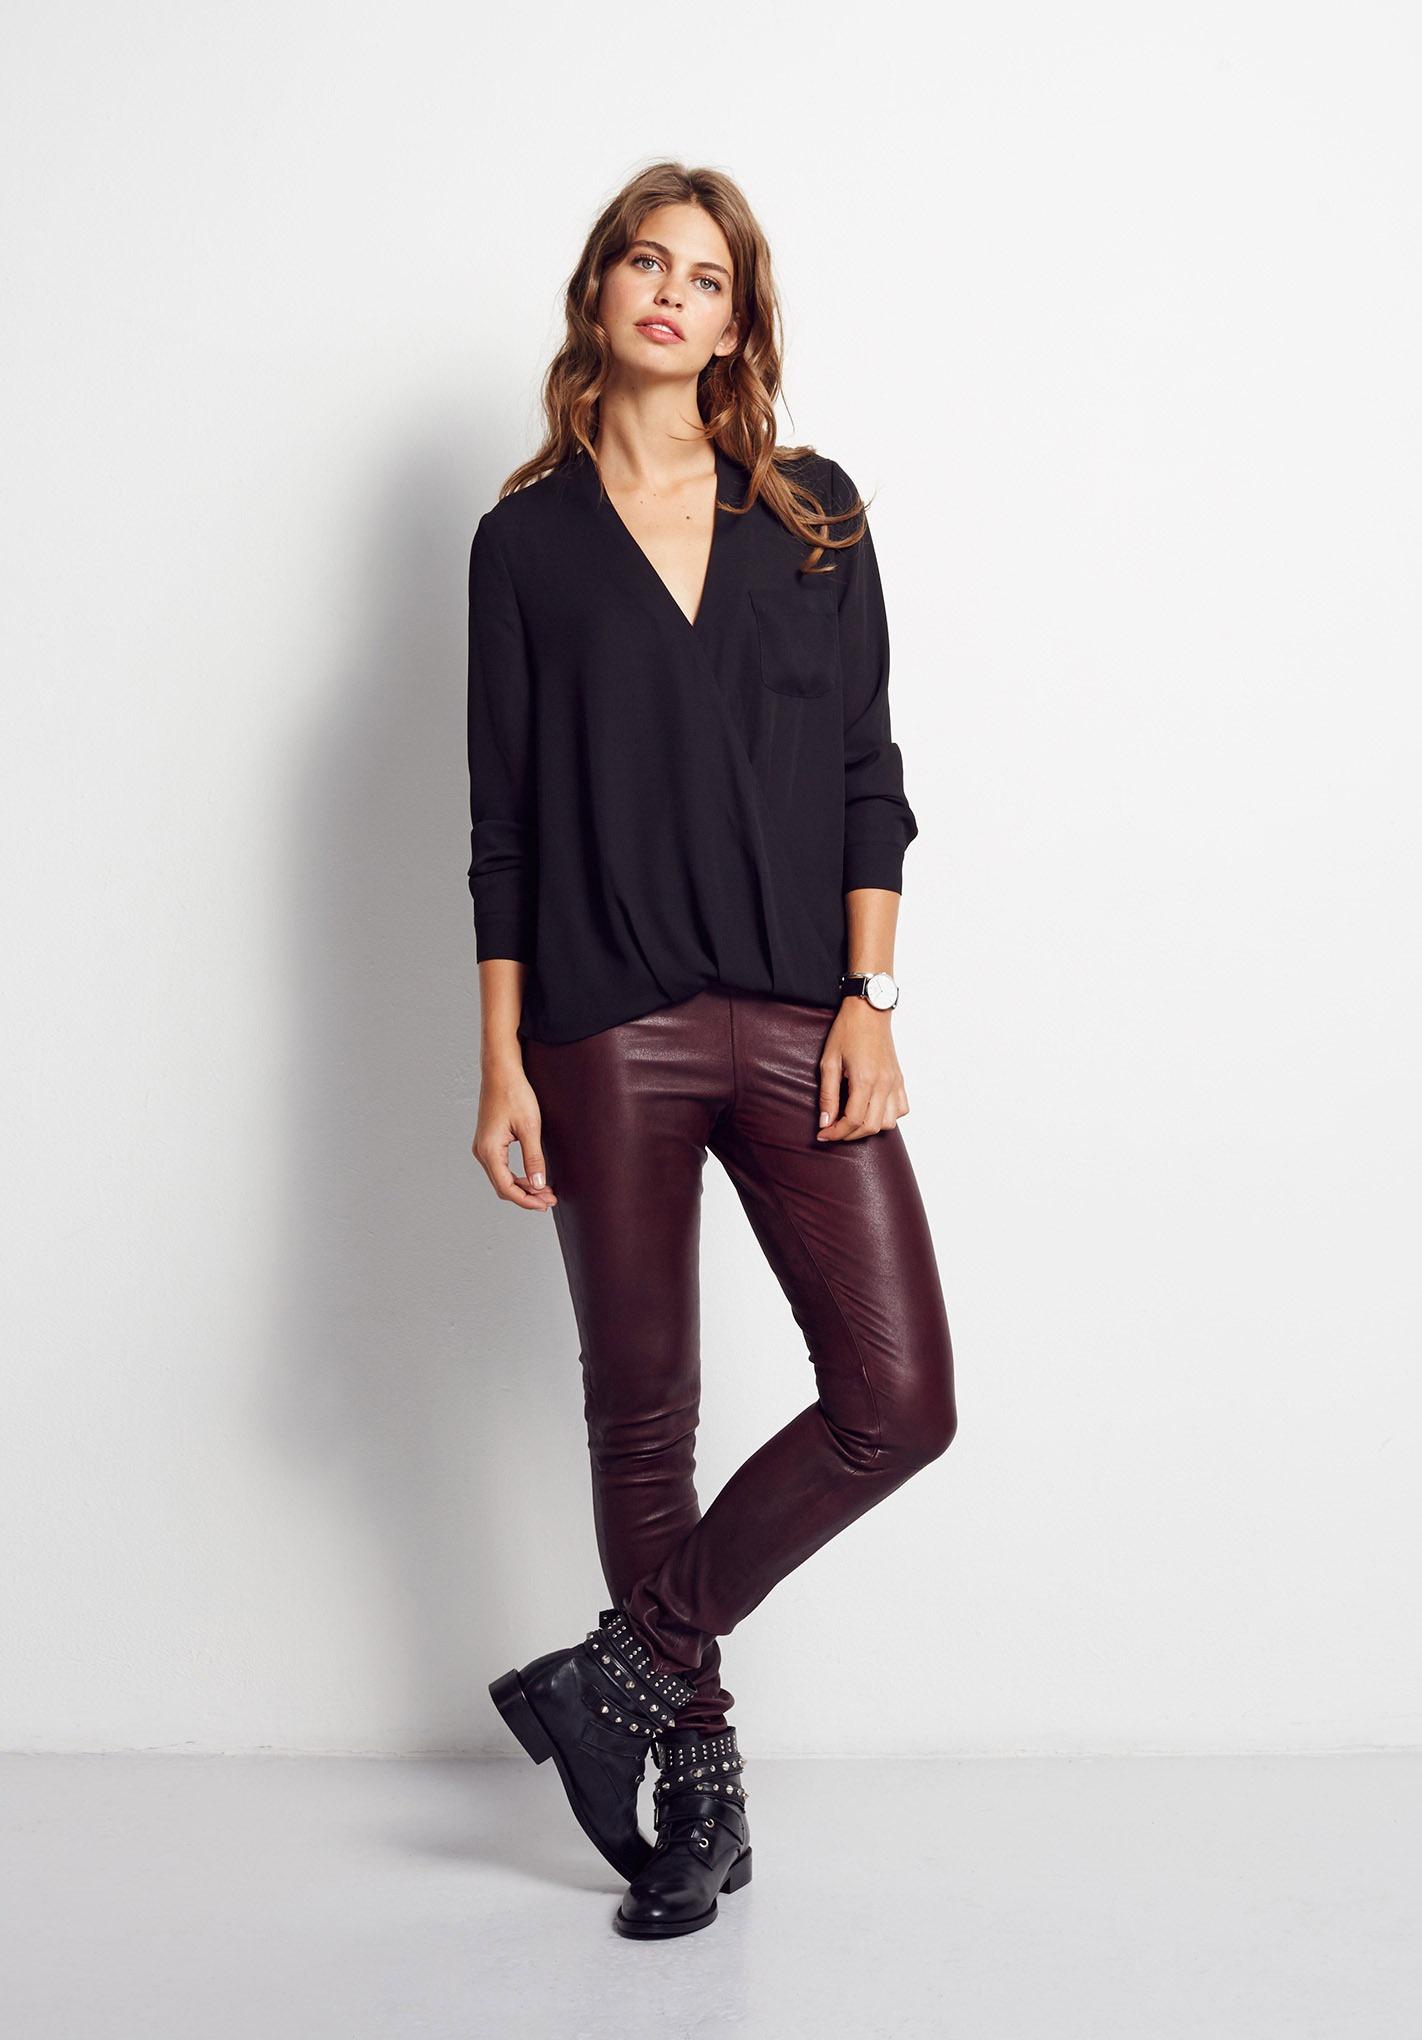 leather leggings-BUR-01